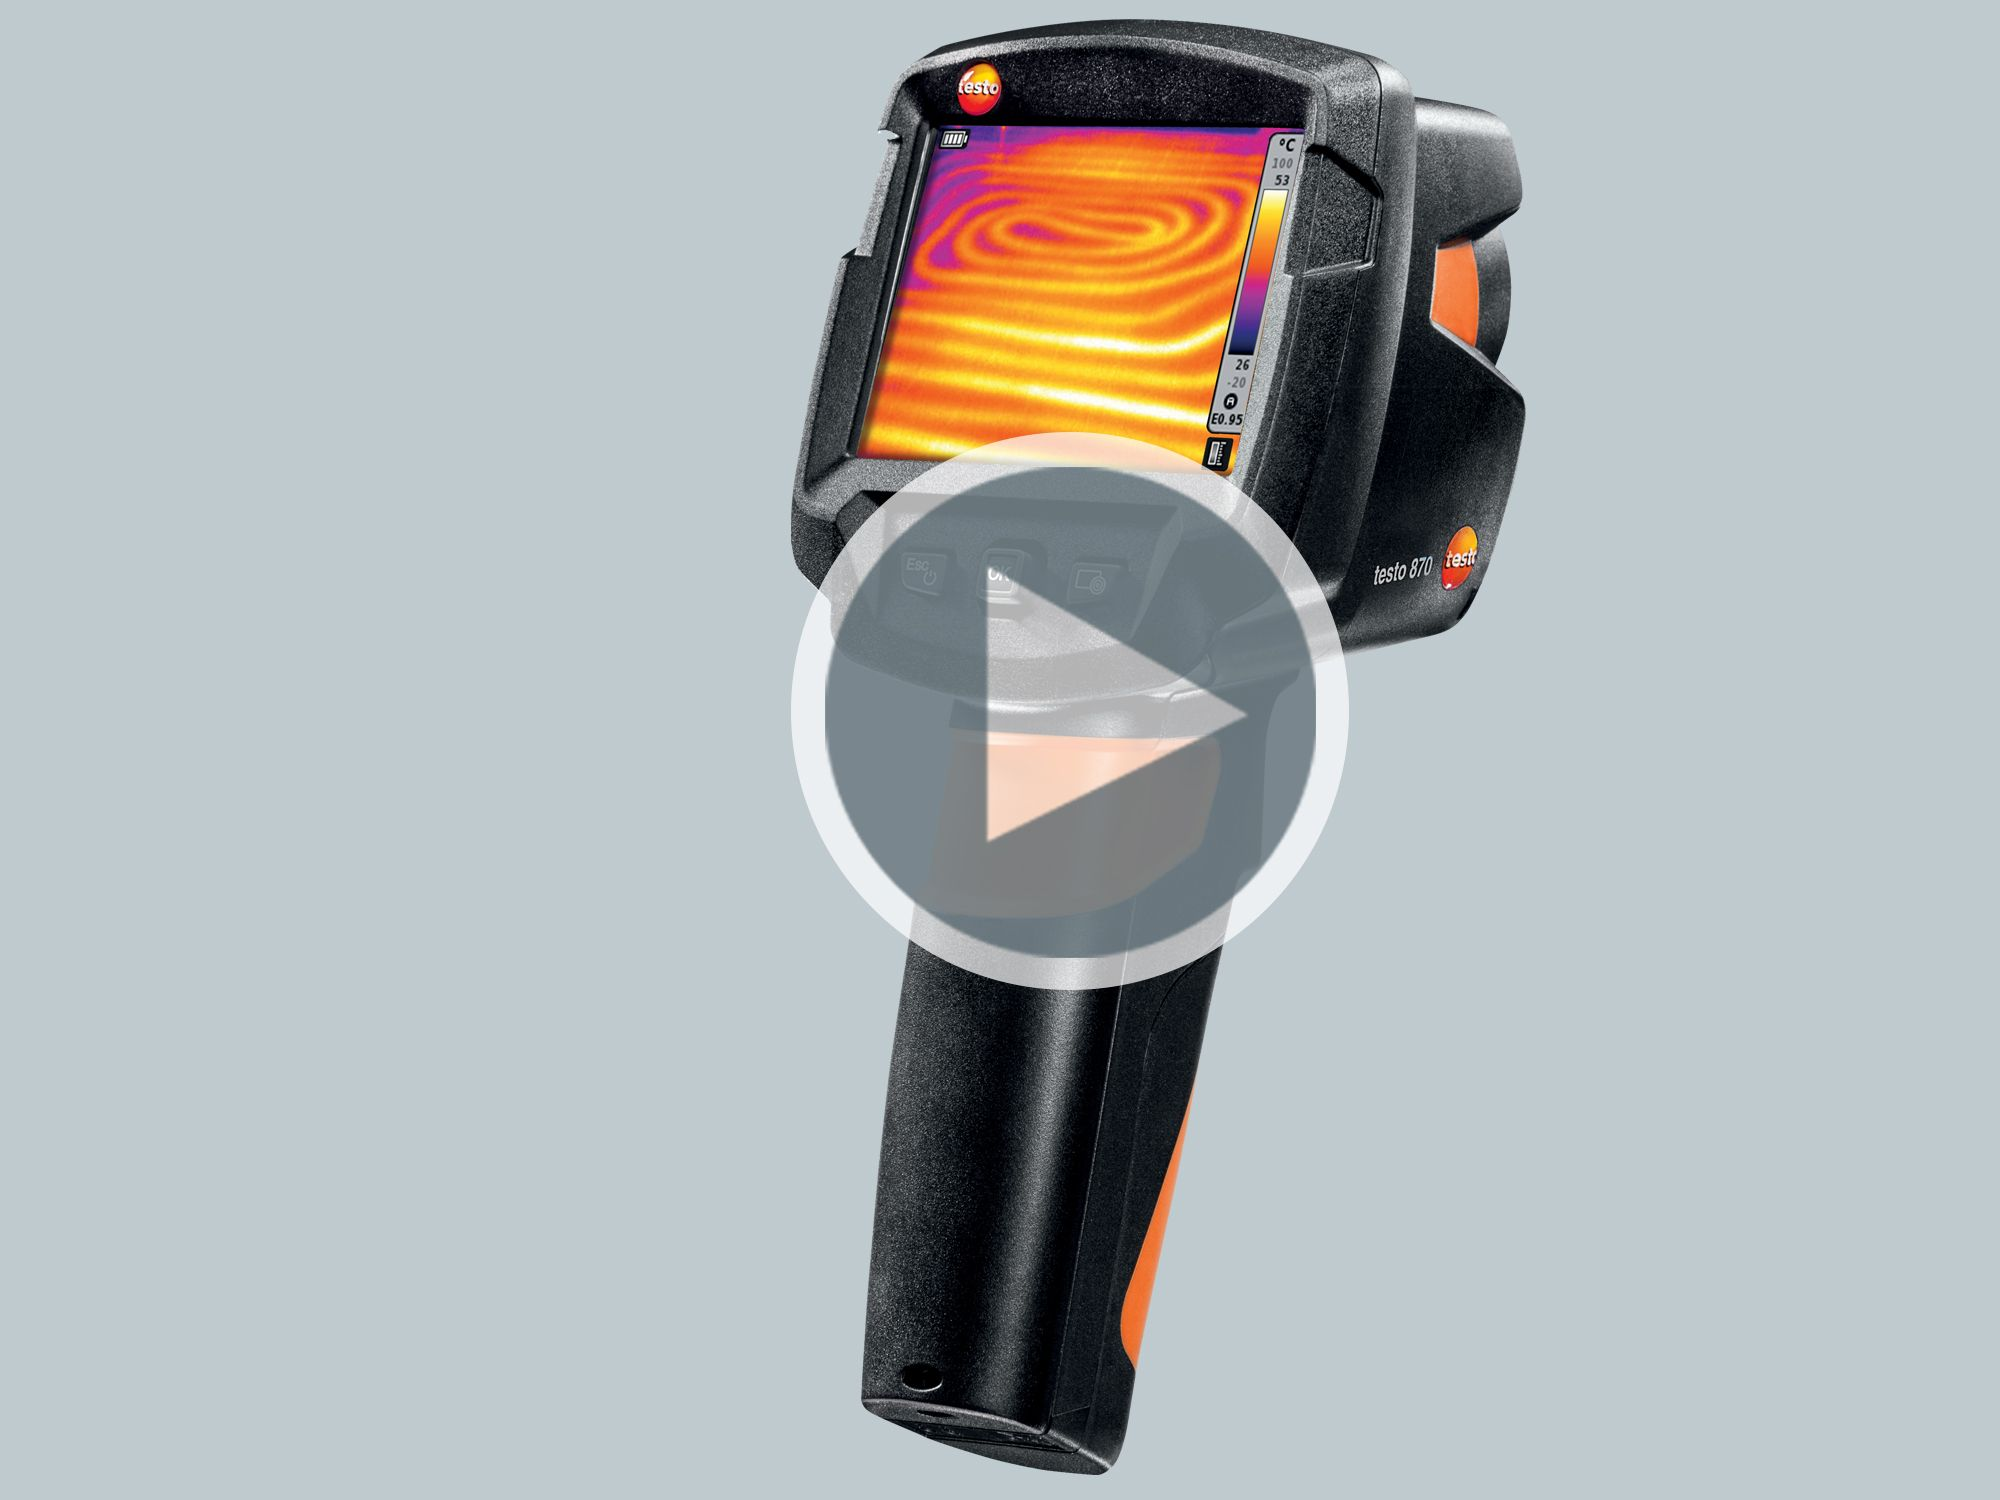 How-To Videos_ testo 870